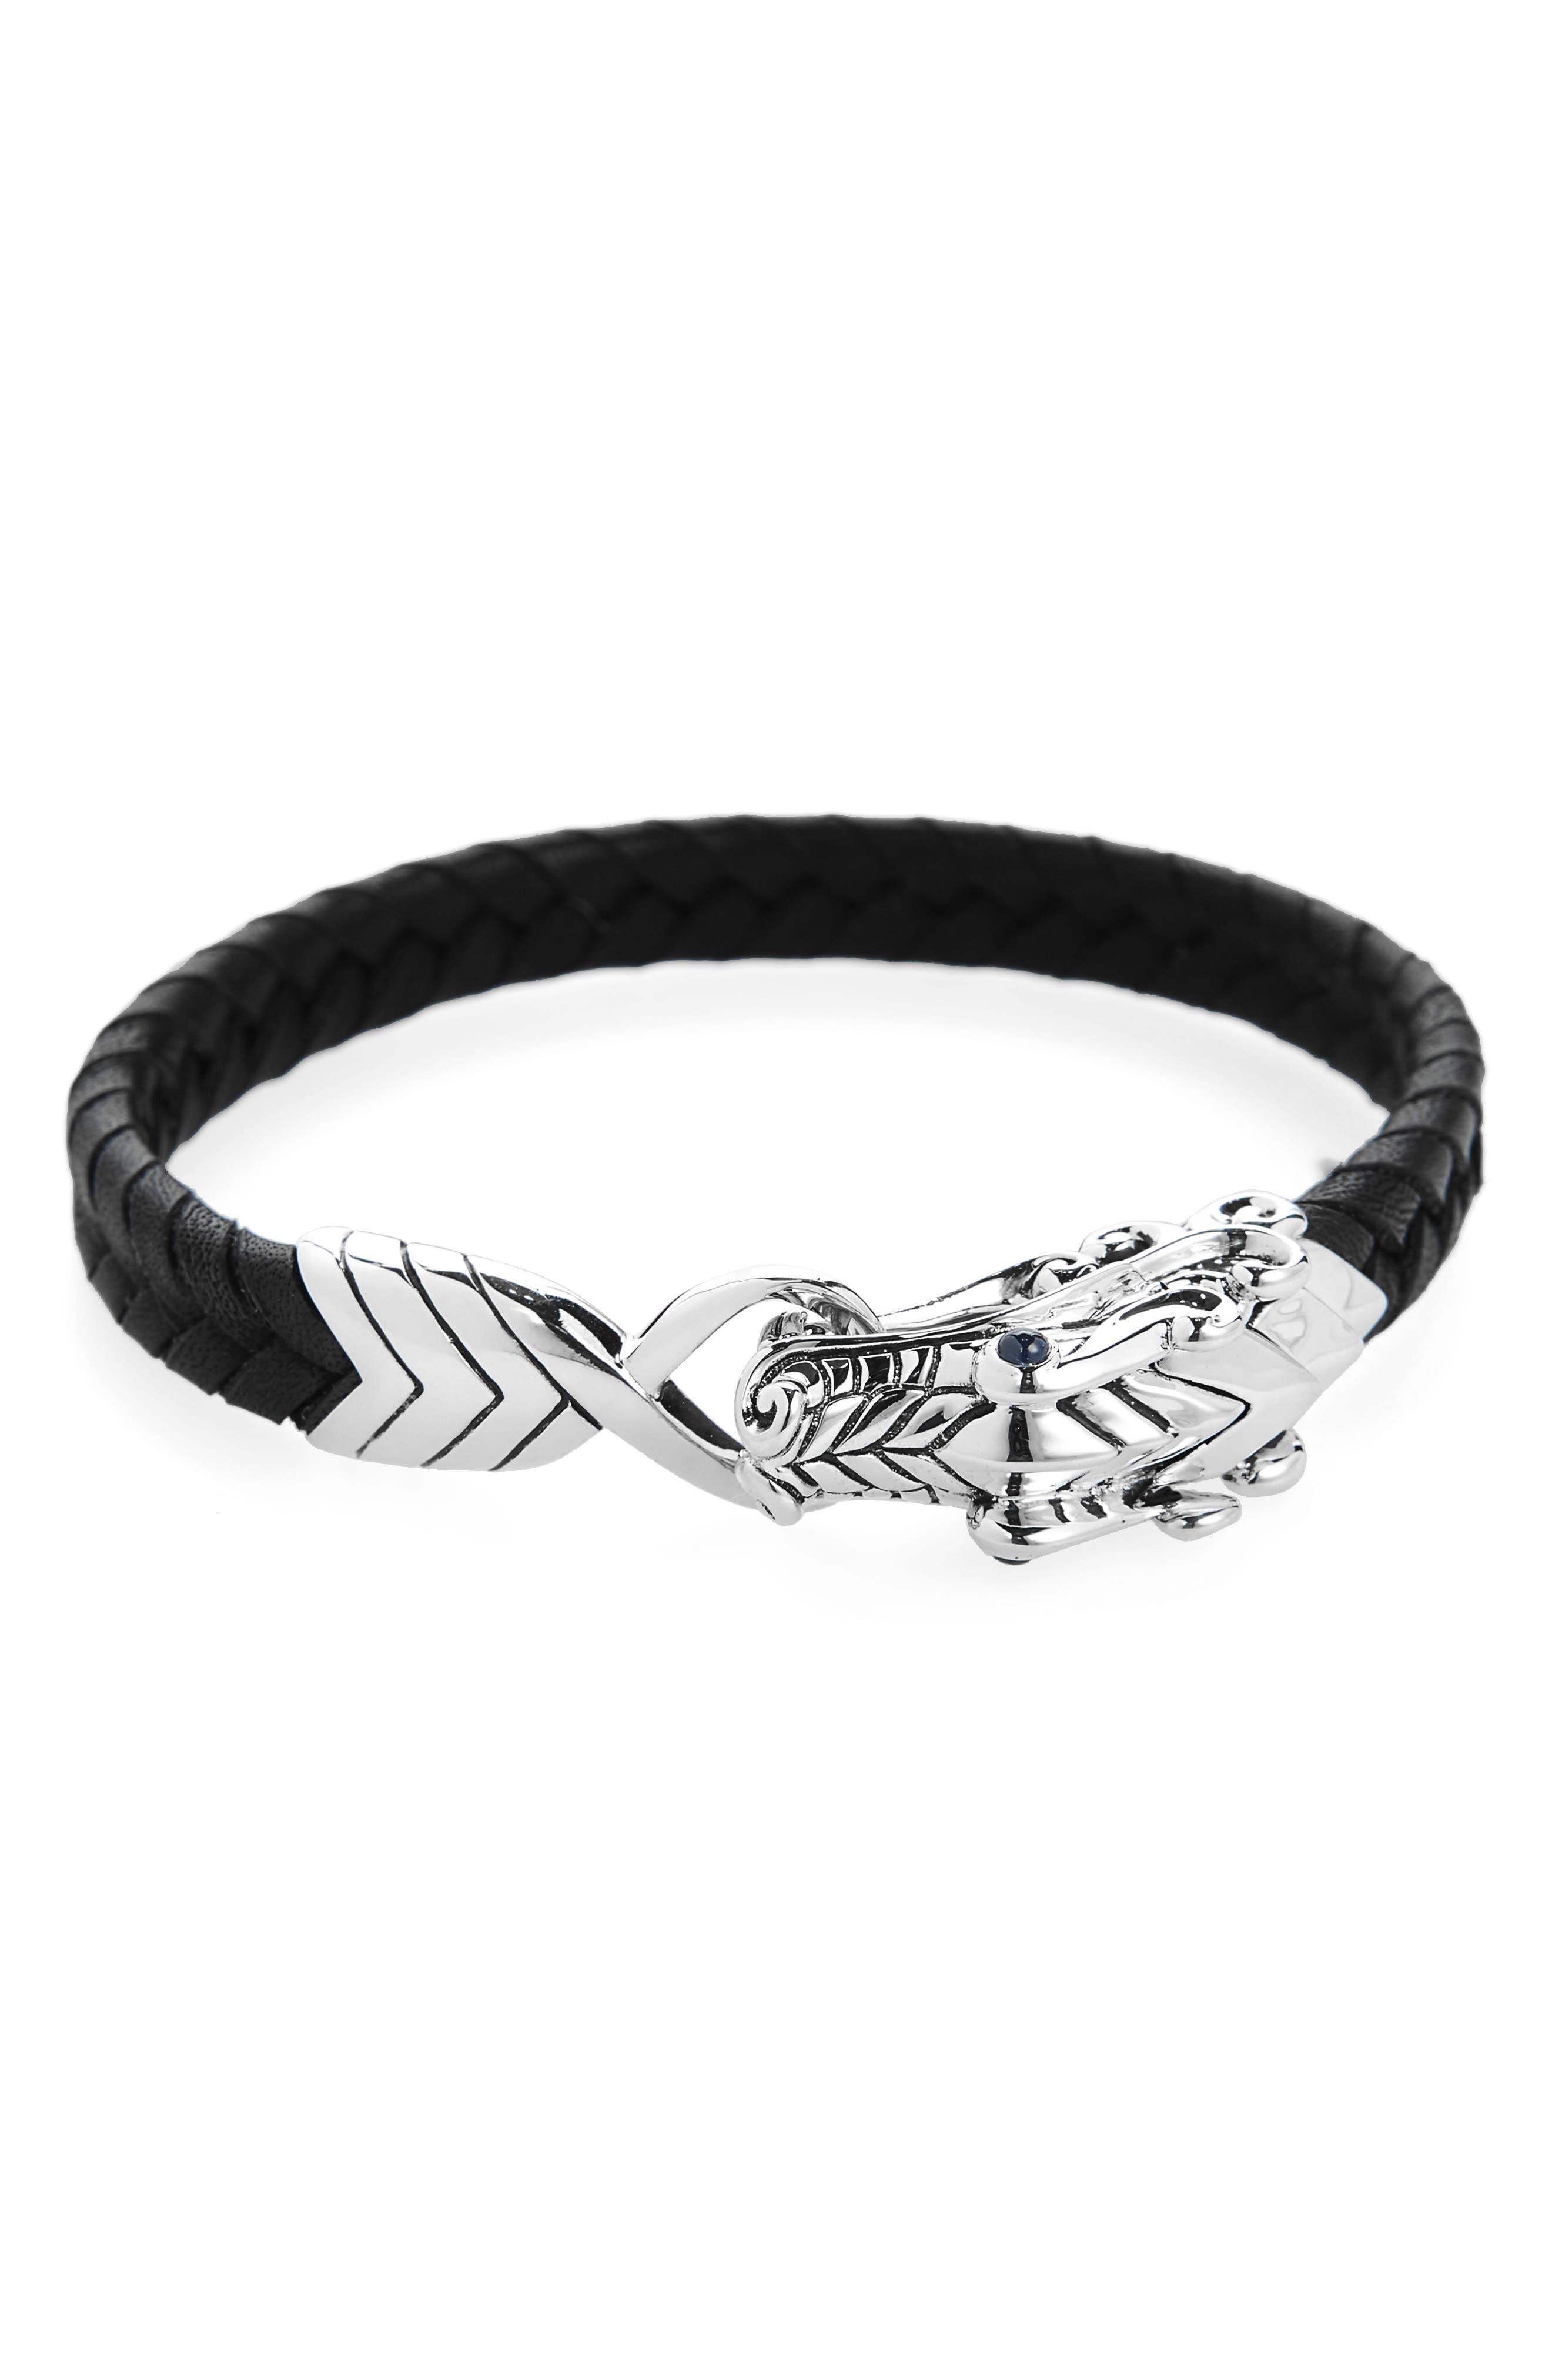 Legends Naga Bracelet,                             Alternate thumbnail 3, color,                             BLACK